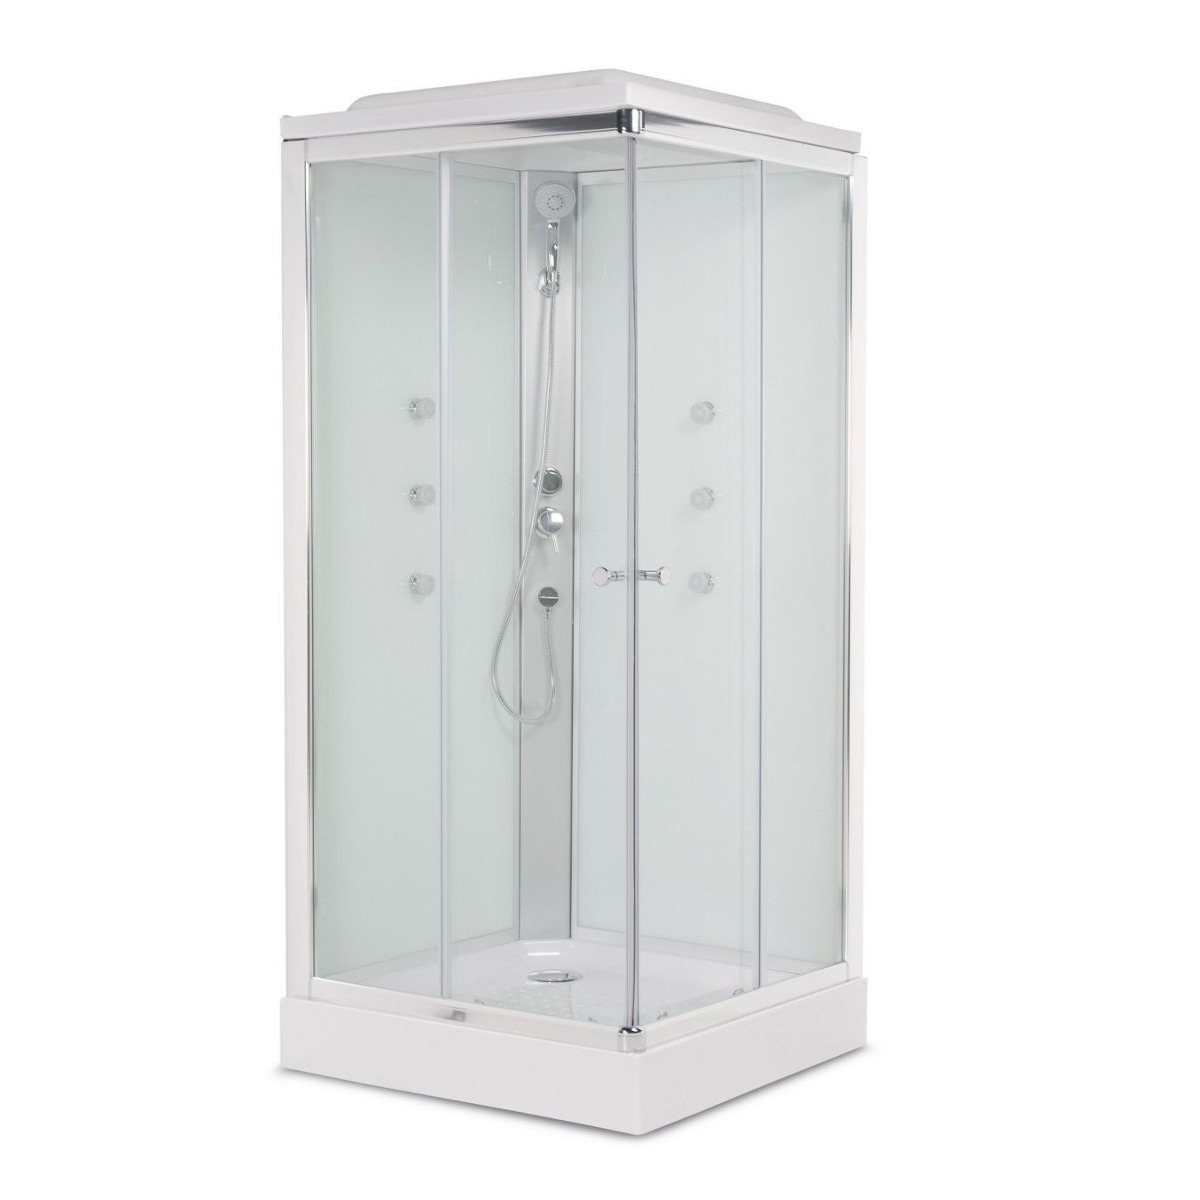 Cabinas de ducha hidromasaje cool cabina de ducha talia n - Quitar cristal templado ...